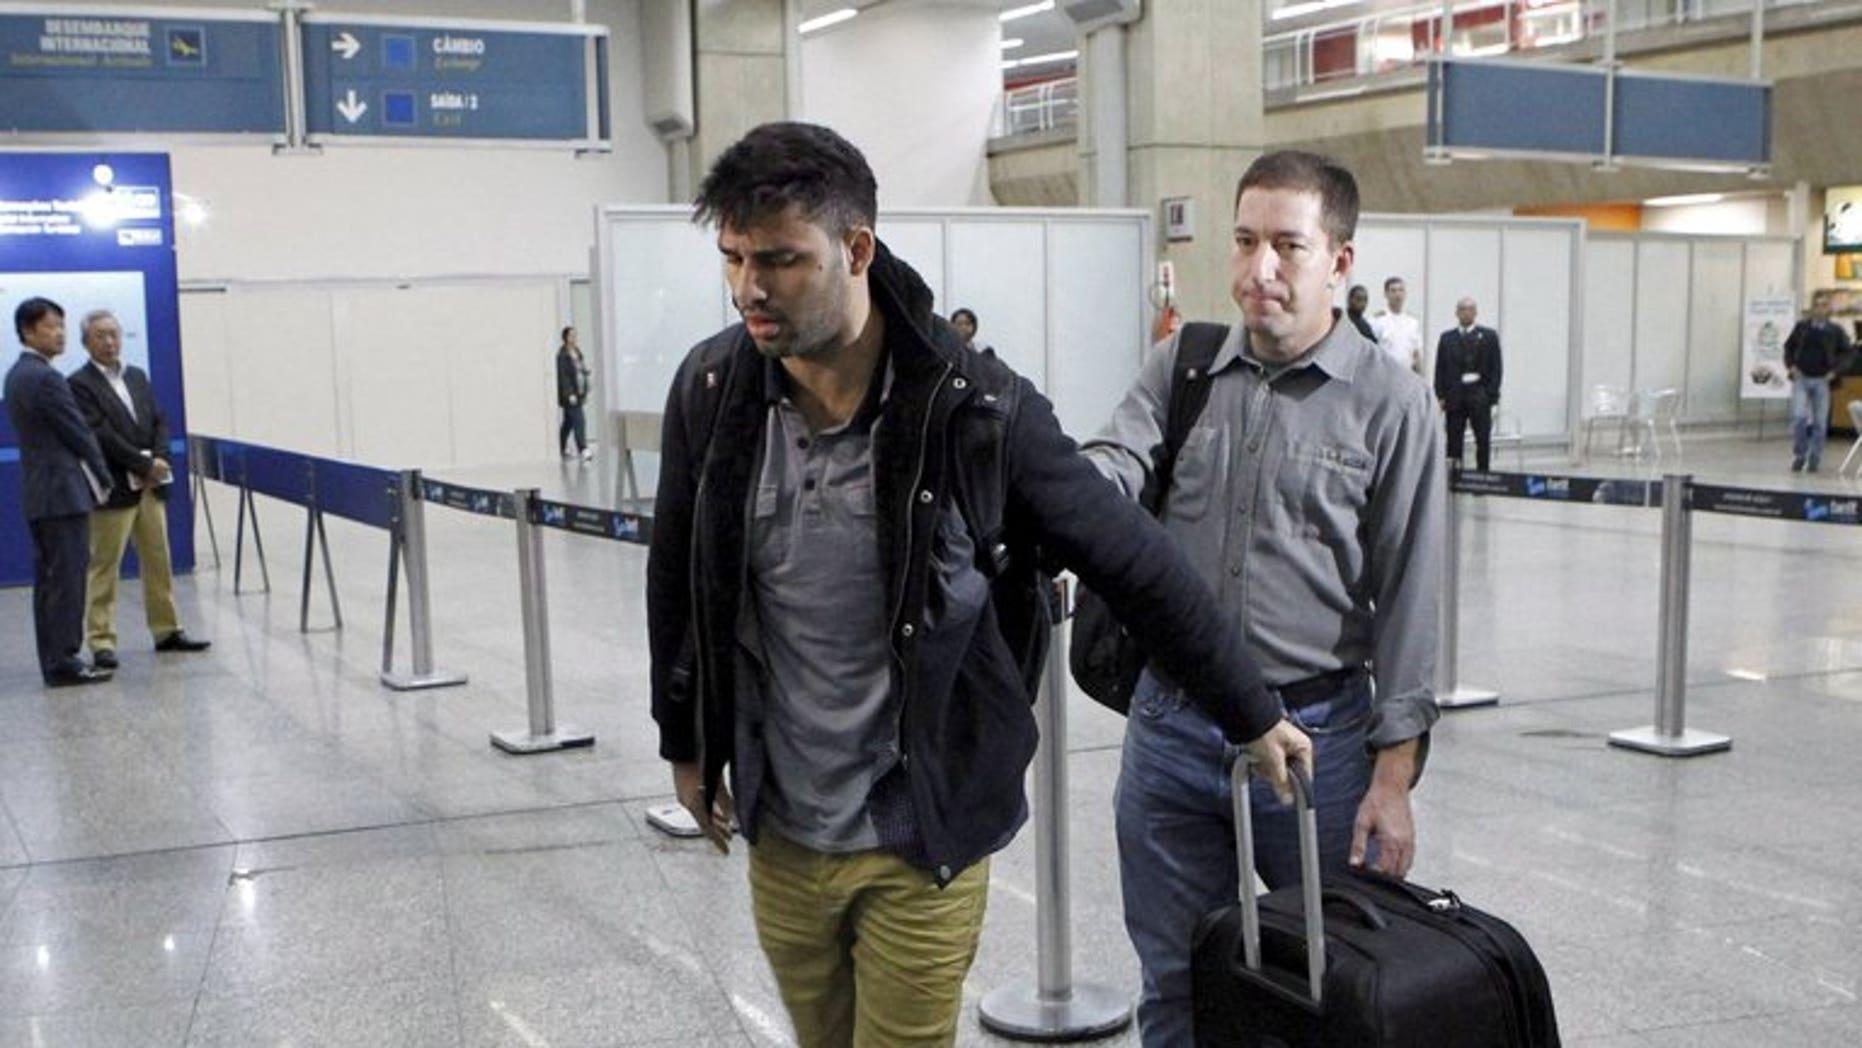 David Miranda (L), partner of Glenn Greenwald, is seen at Rio de Janeiro's Tom Jobim international airport on August 19, 2013.